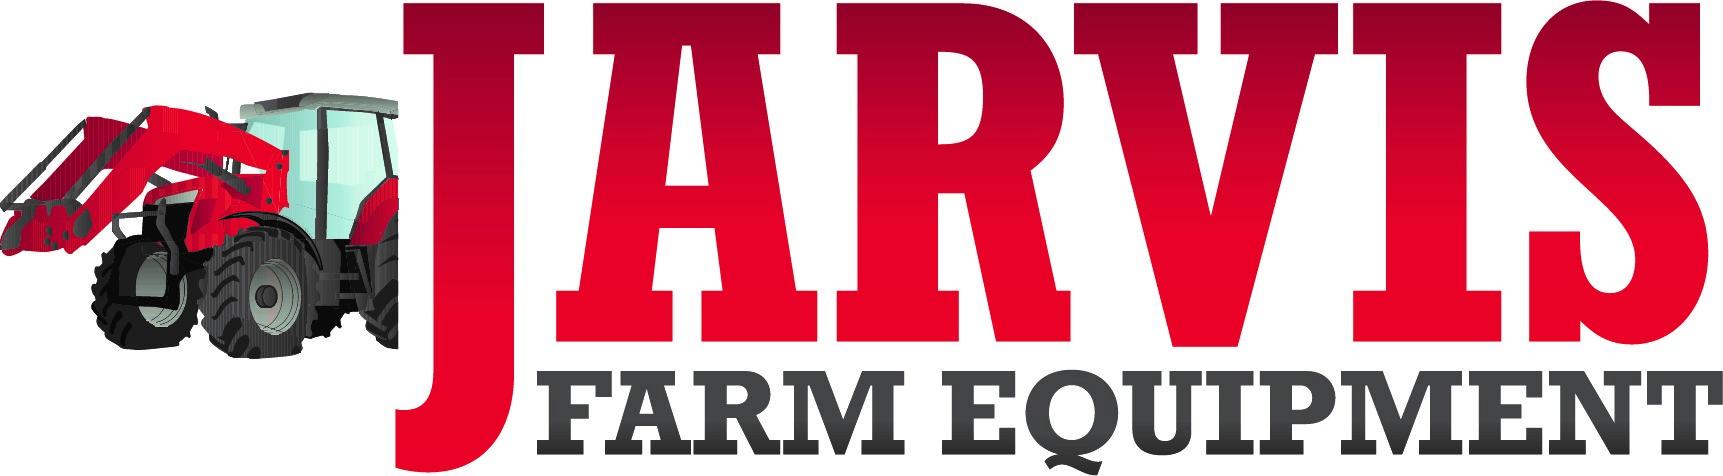 Jarvis farm